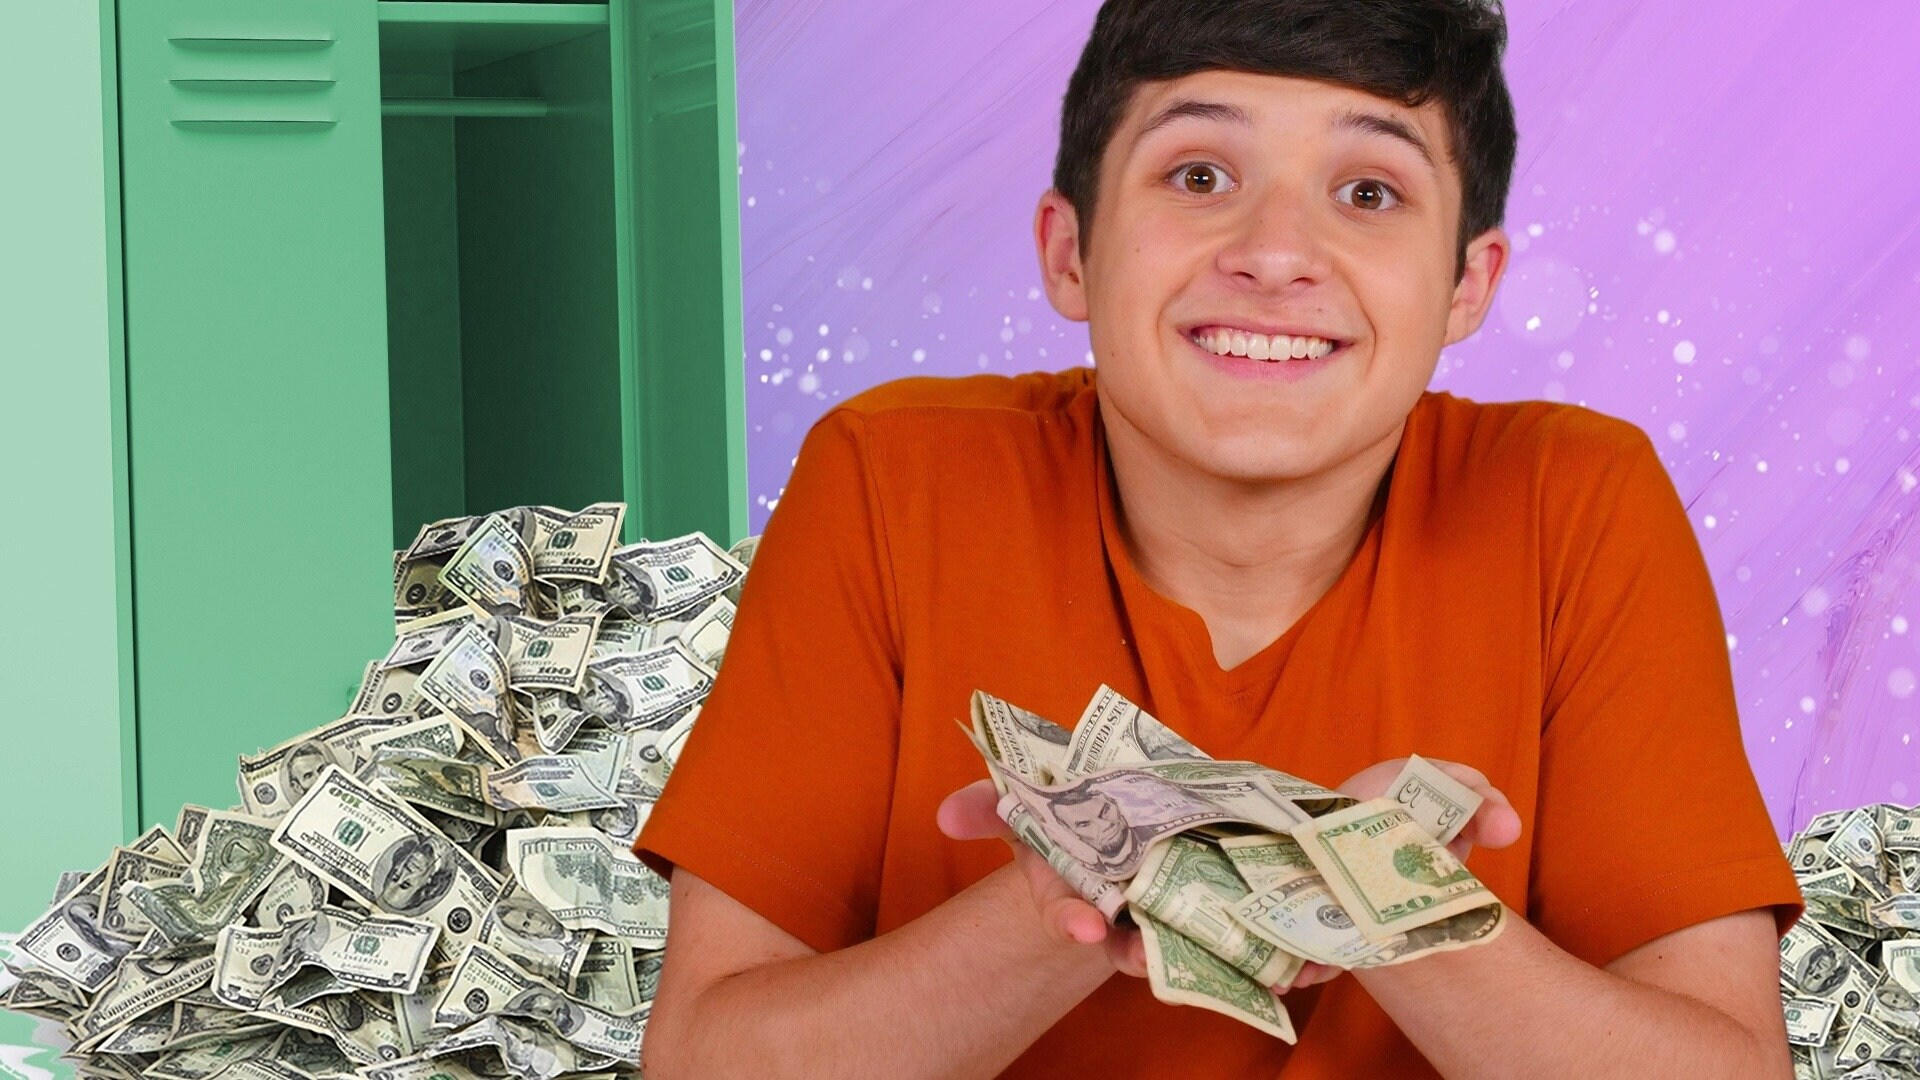 Locker Money Trick